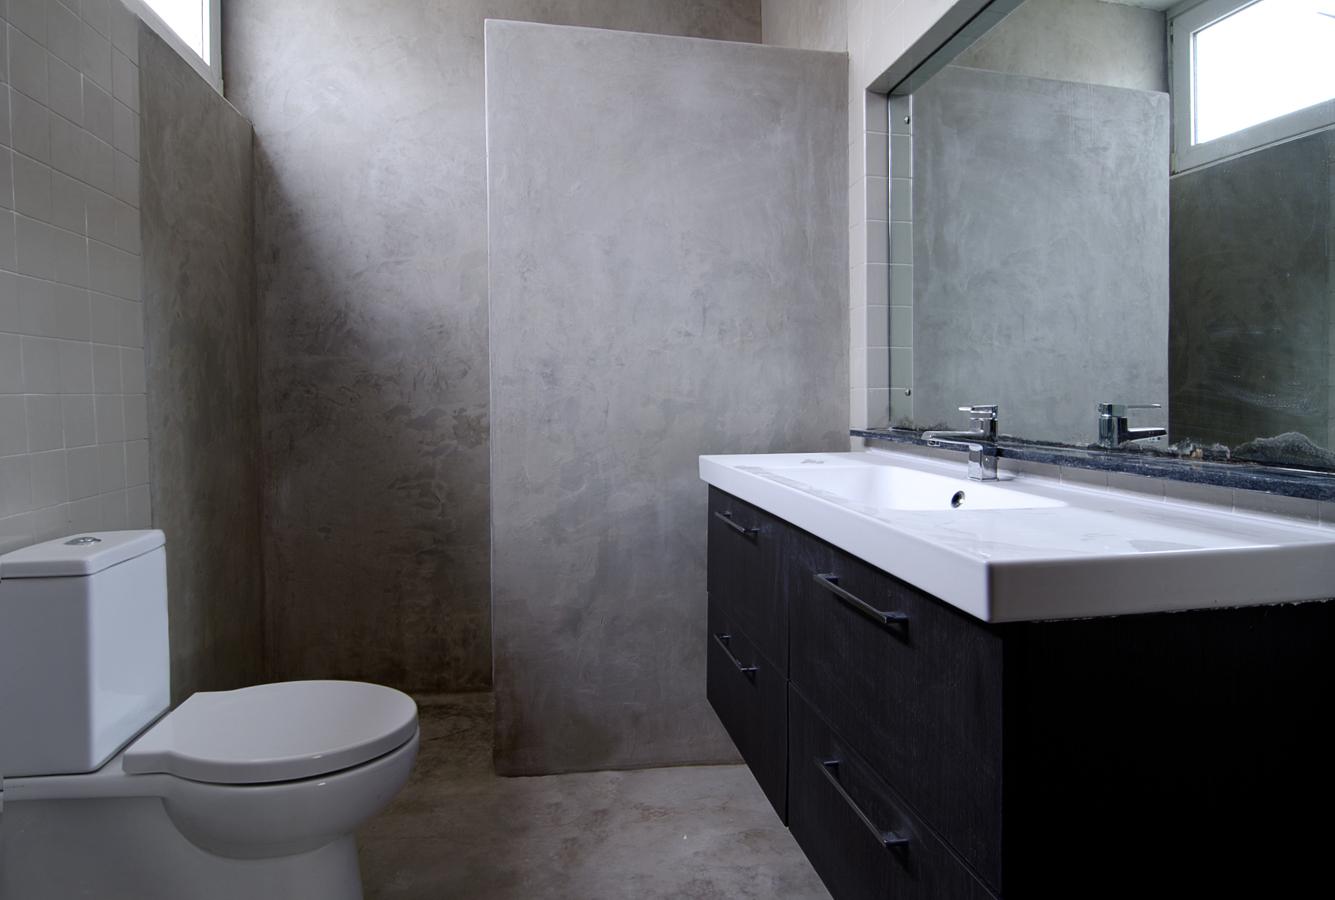 Foto ba o con paredes y suelo de microcemento de finwet - Microcemento banos ...